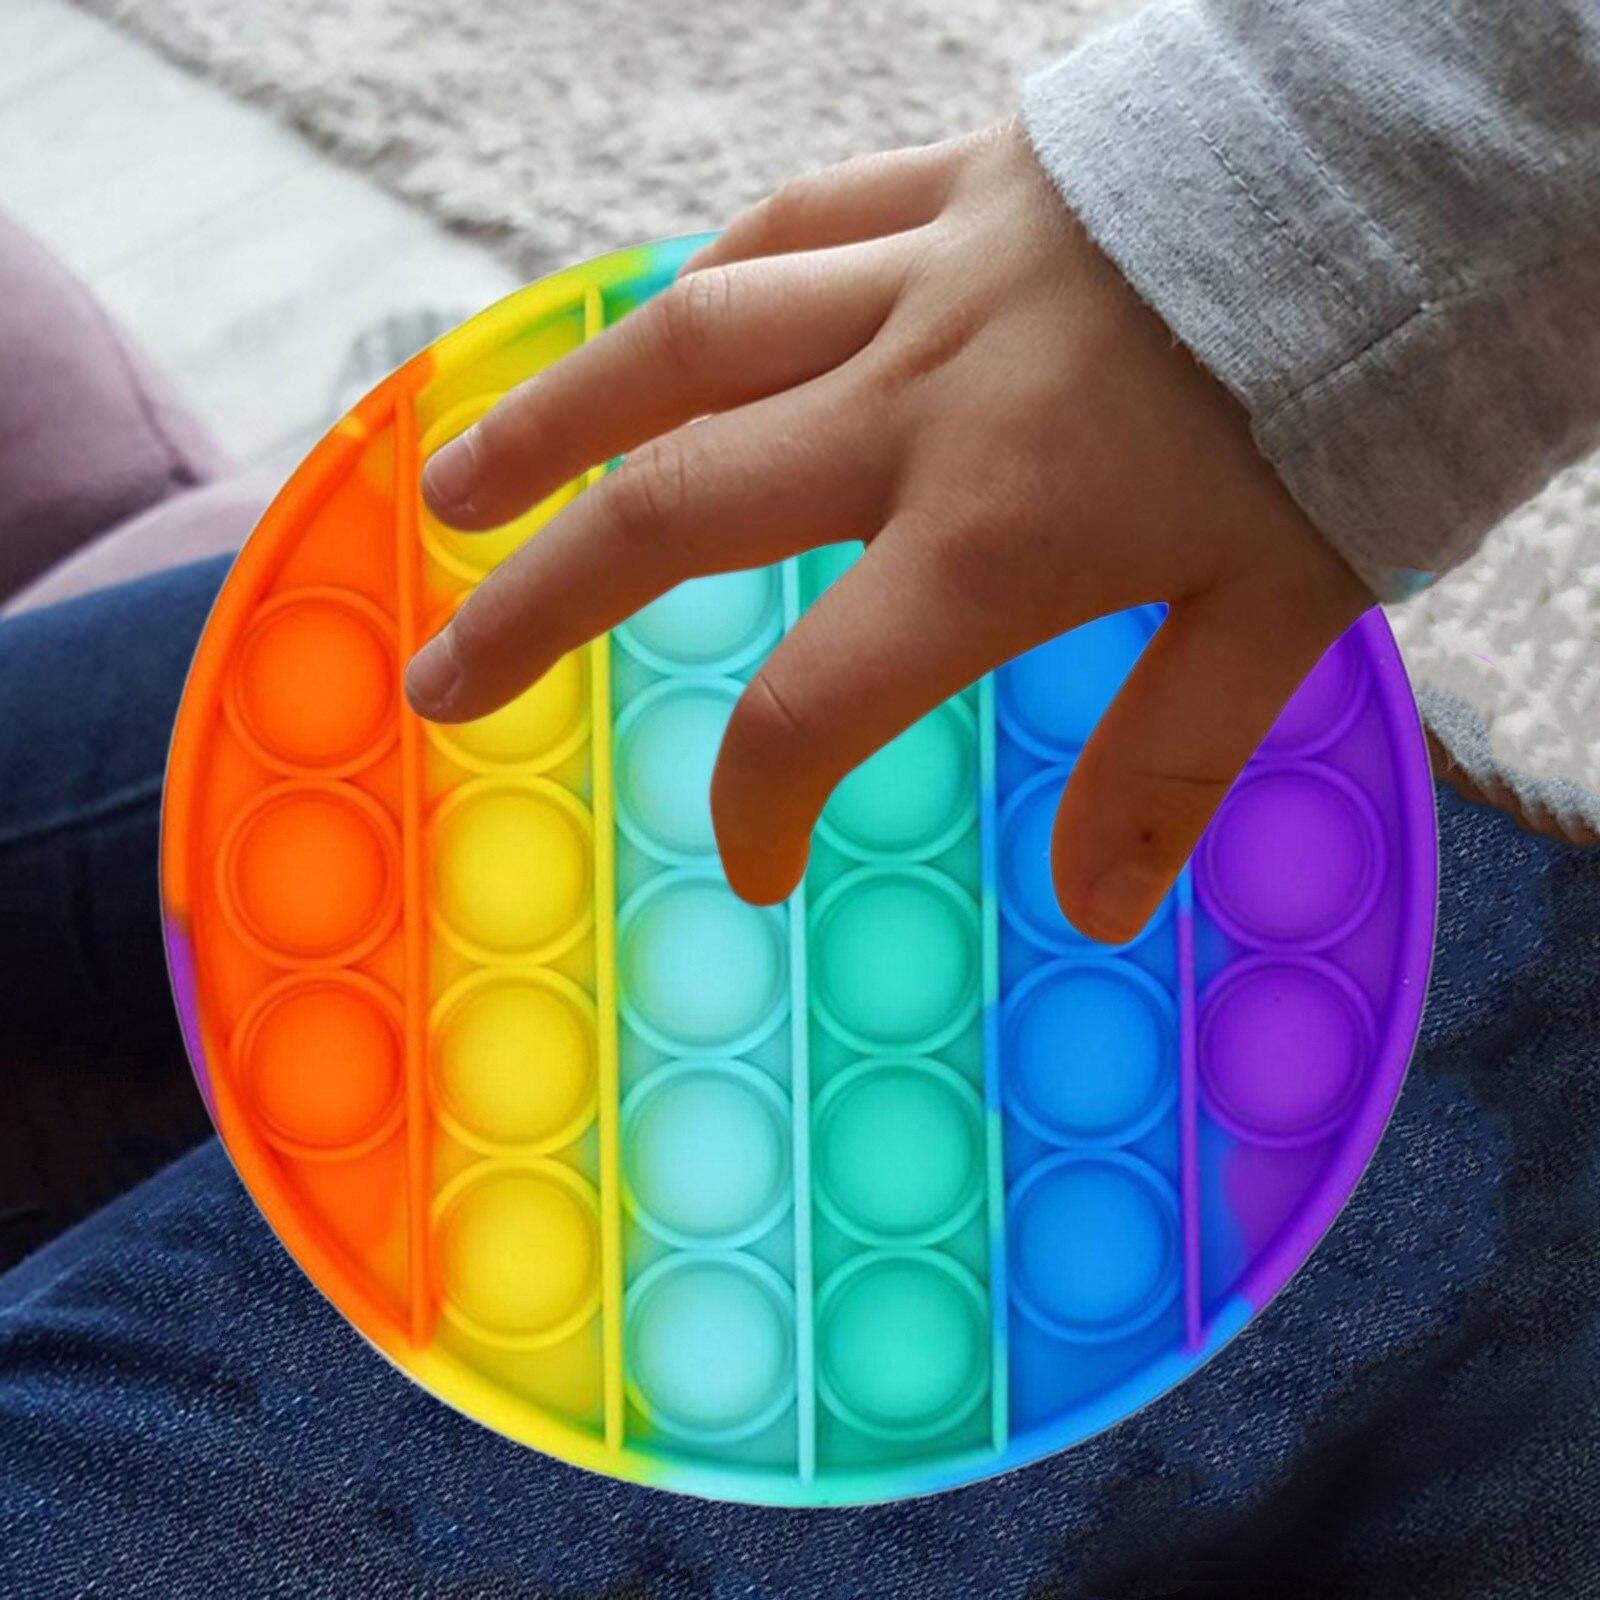 Fidget-Sensory-Toy Game-Stress Bubble Pops Squishy-Pops Special Needs Rainbow-Push Autisim img3